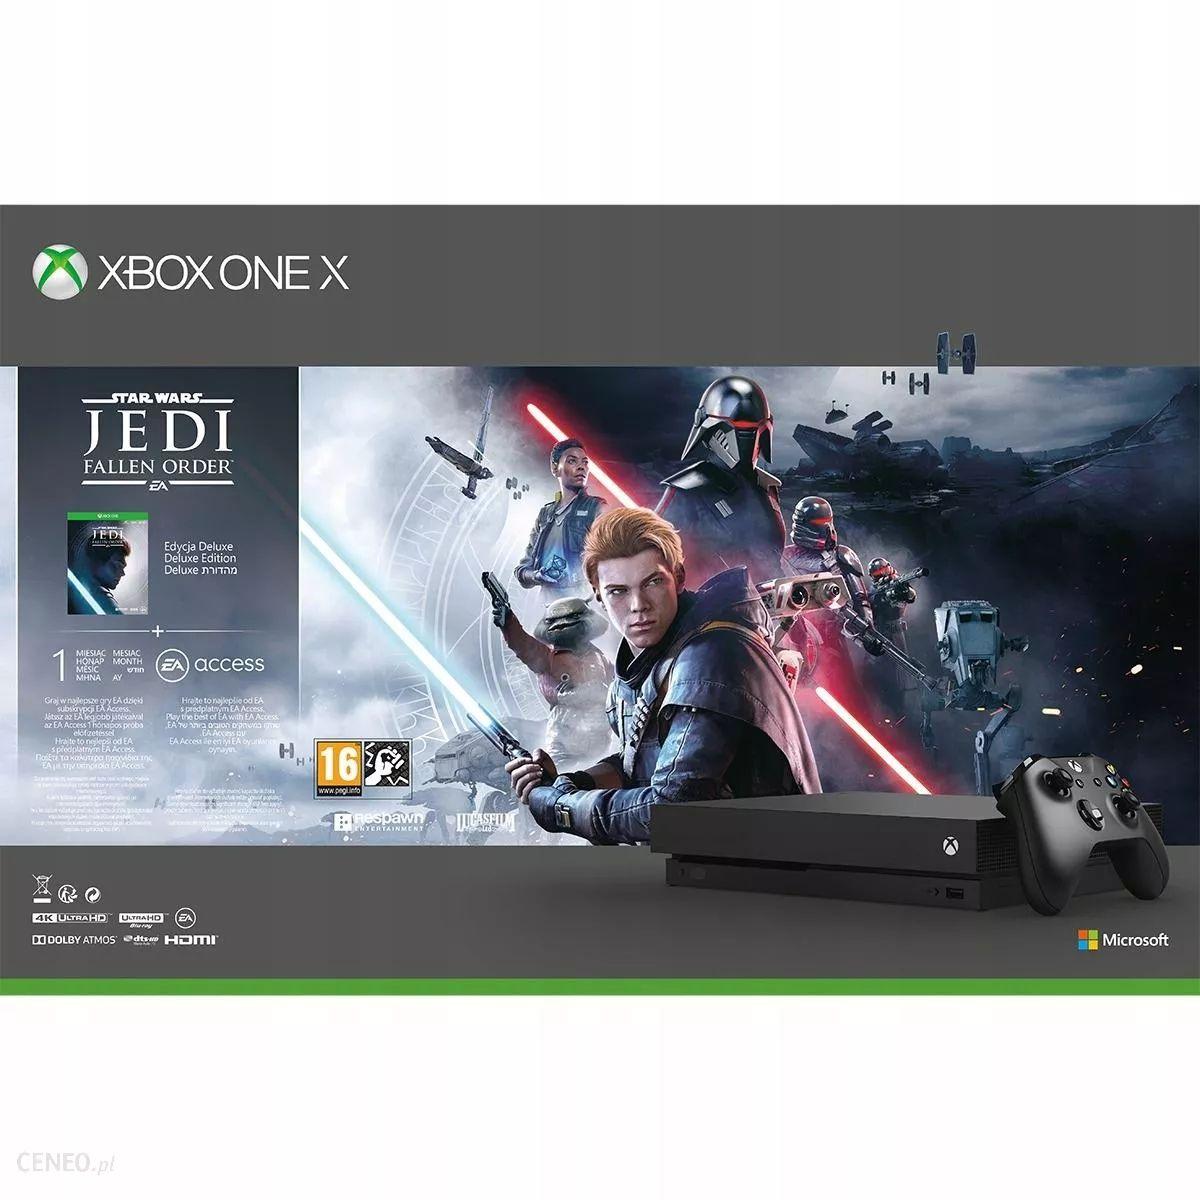 Konsola Xbox One X 1 TB Jedi: Fallen Order/Gears 5 Amazon.de